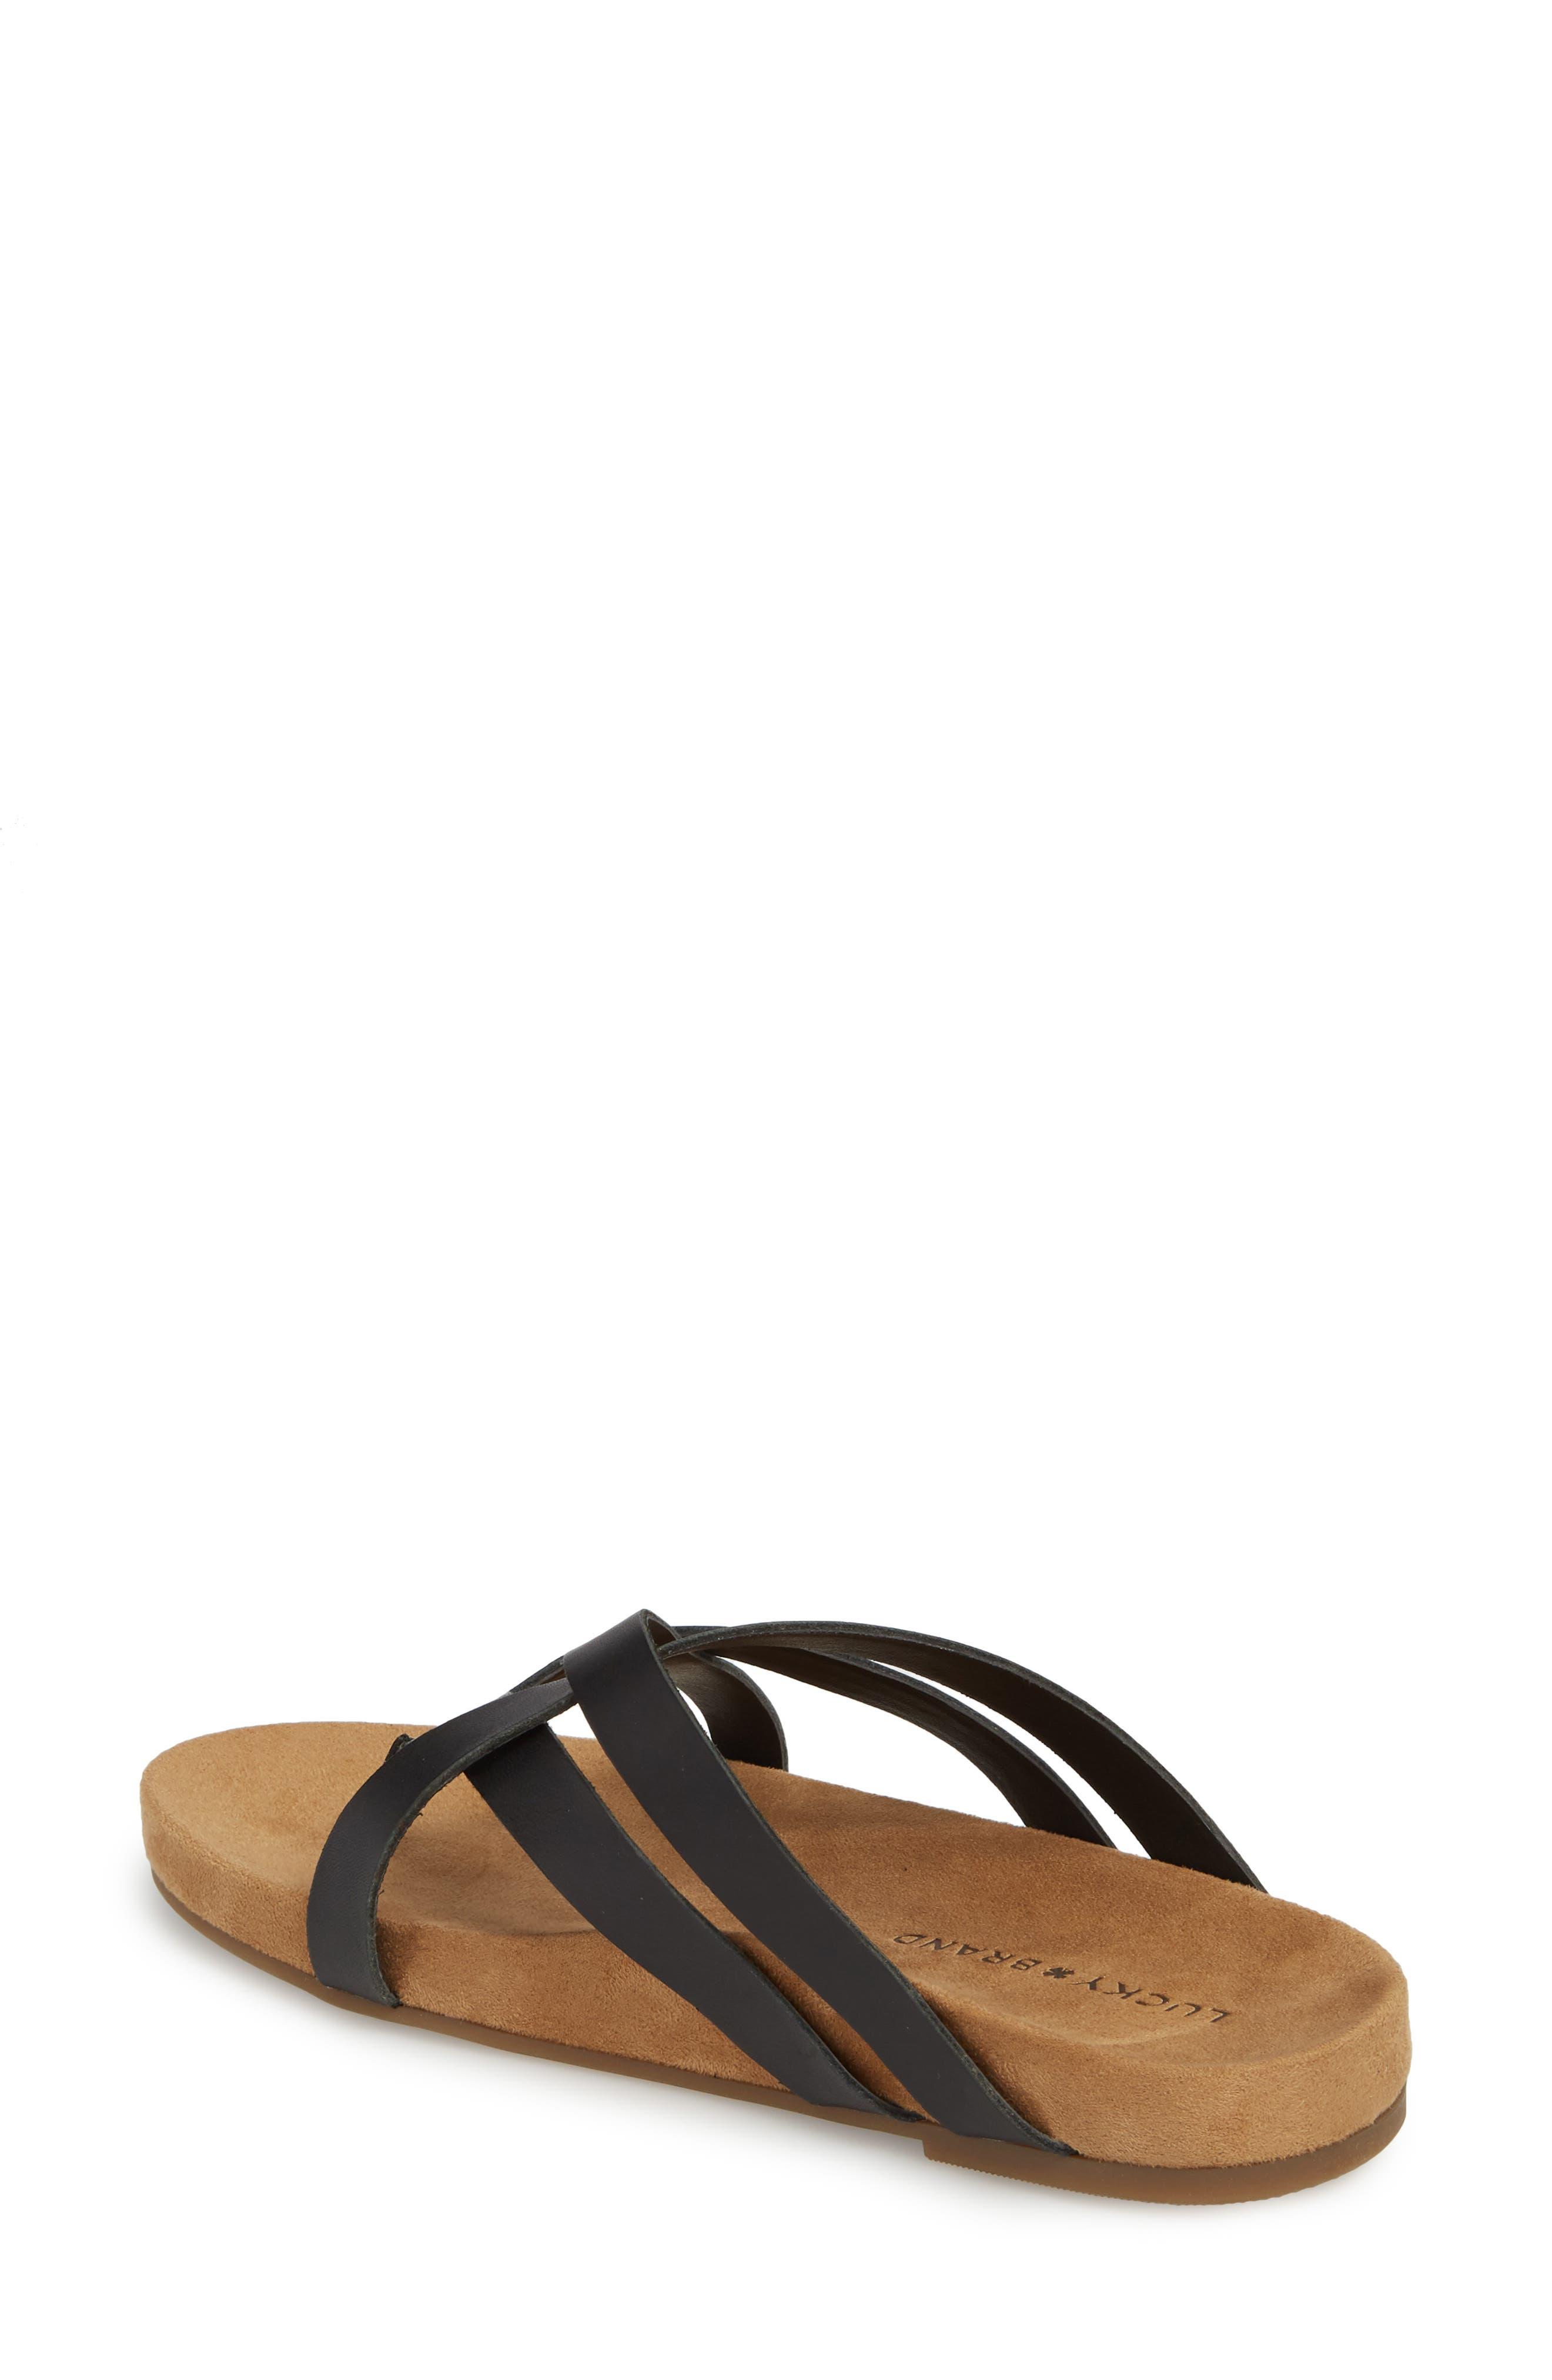 Fillima Flip Flop,                             Alternate thumbnail 2, color,                             Black Leather